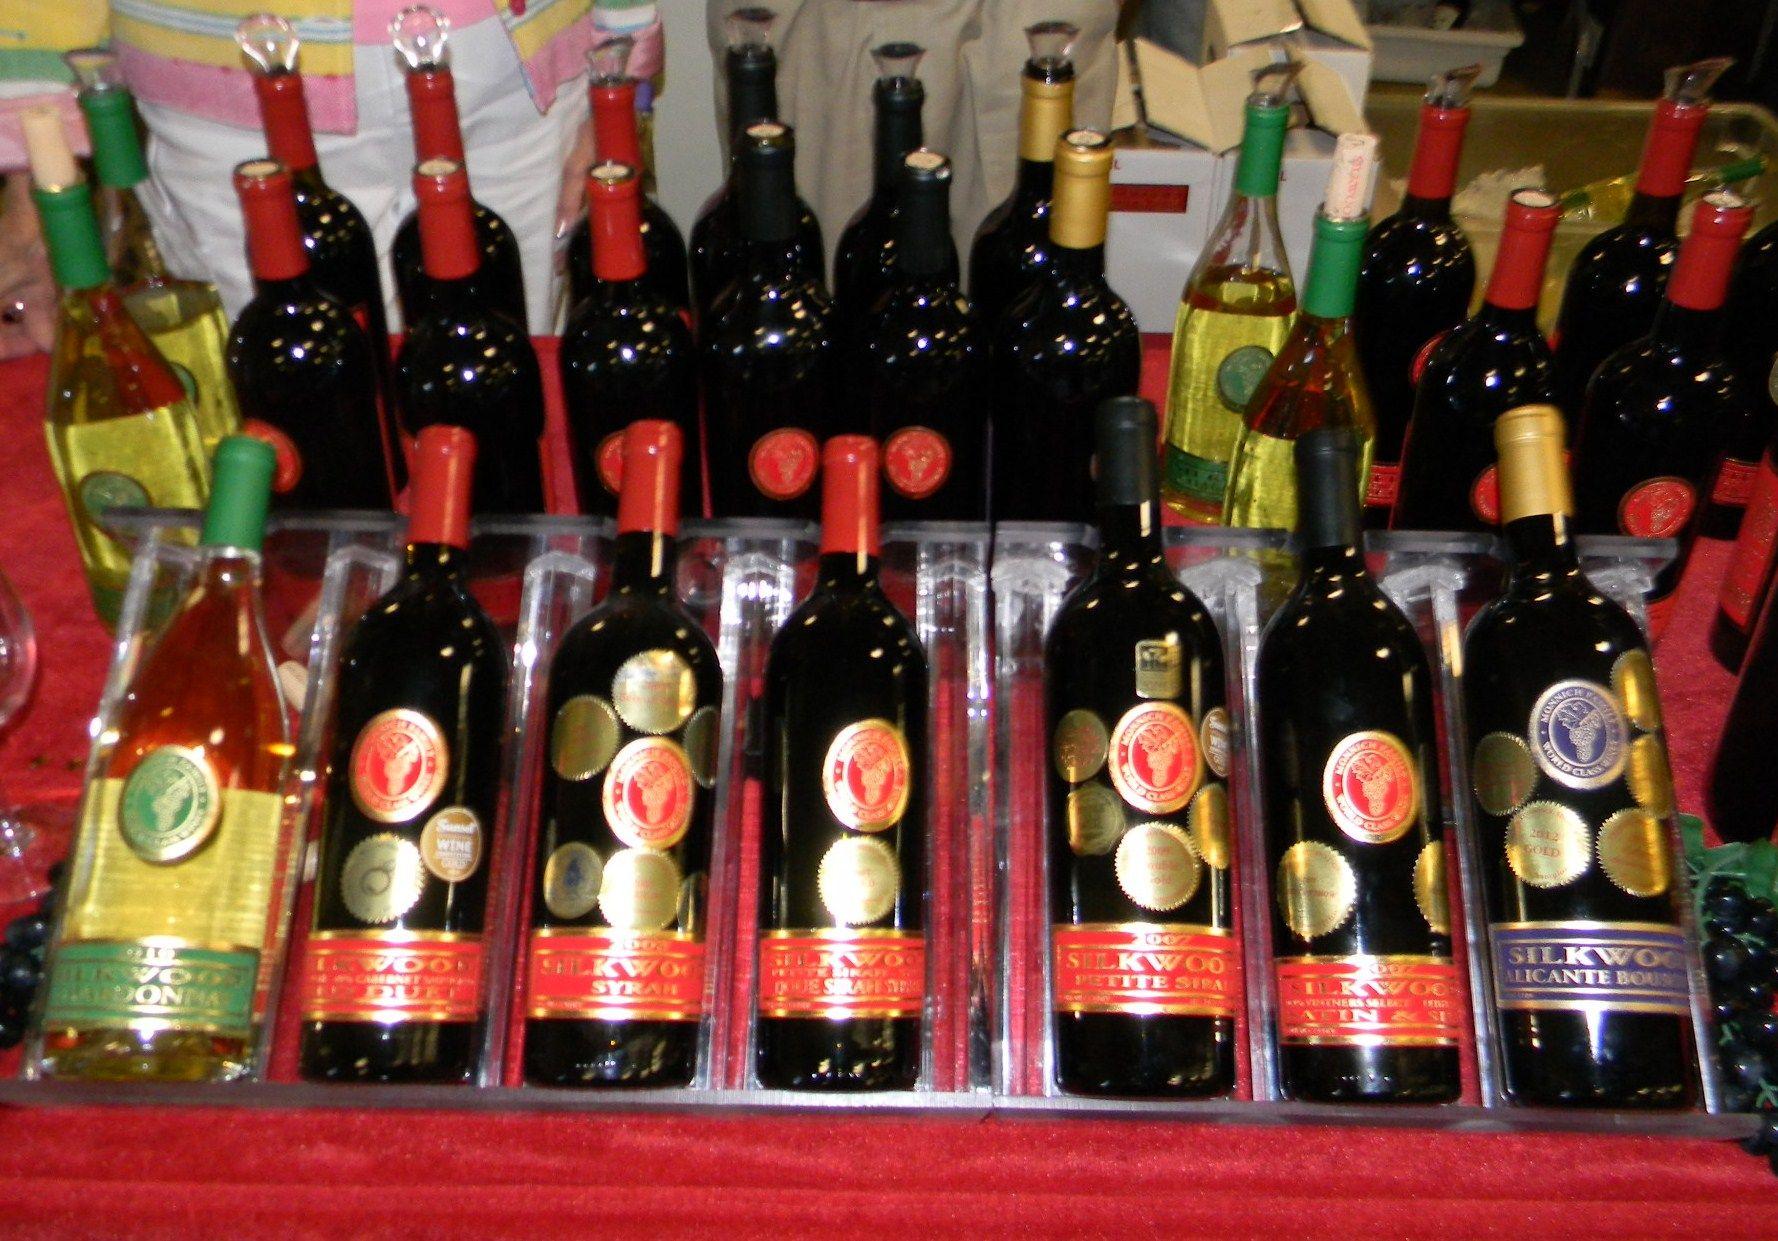 Silkwood Wines Monnich Family World Class Wines Family World Wines Wine Bottle